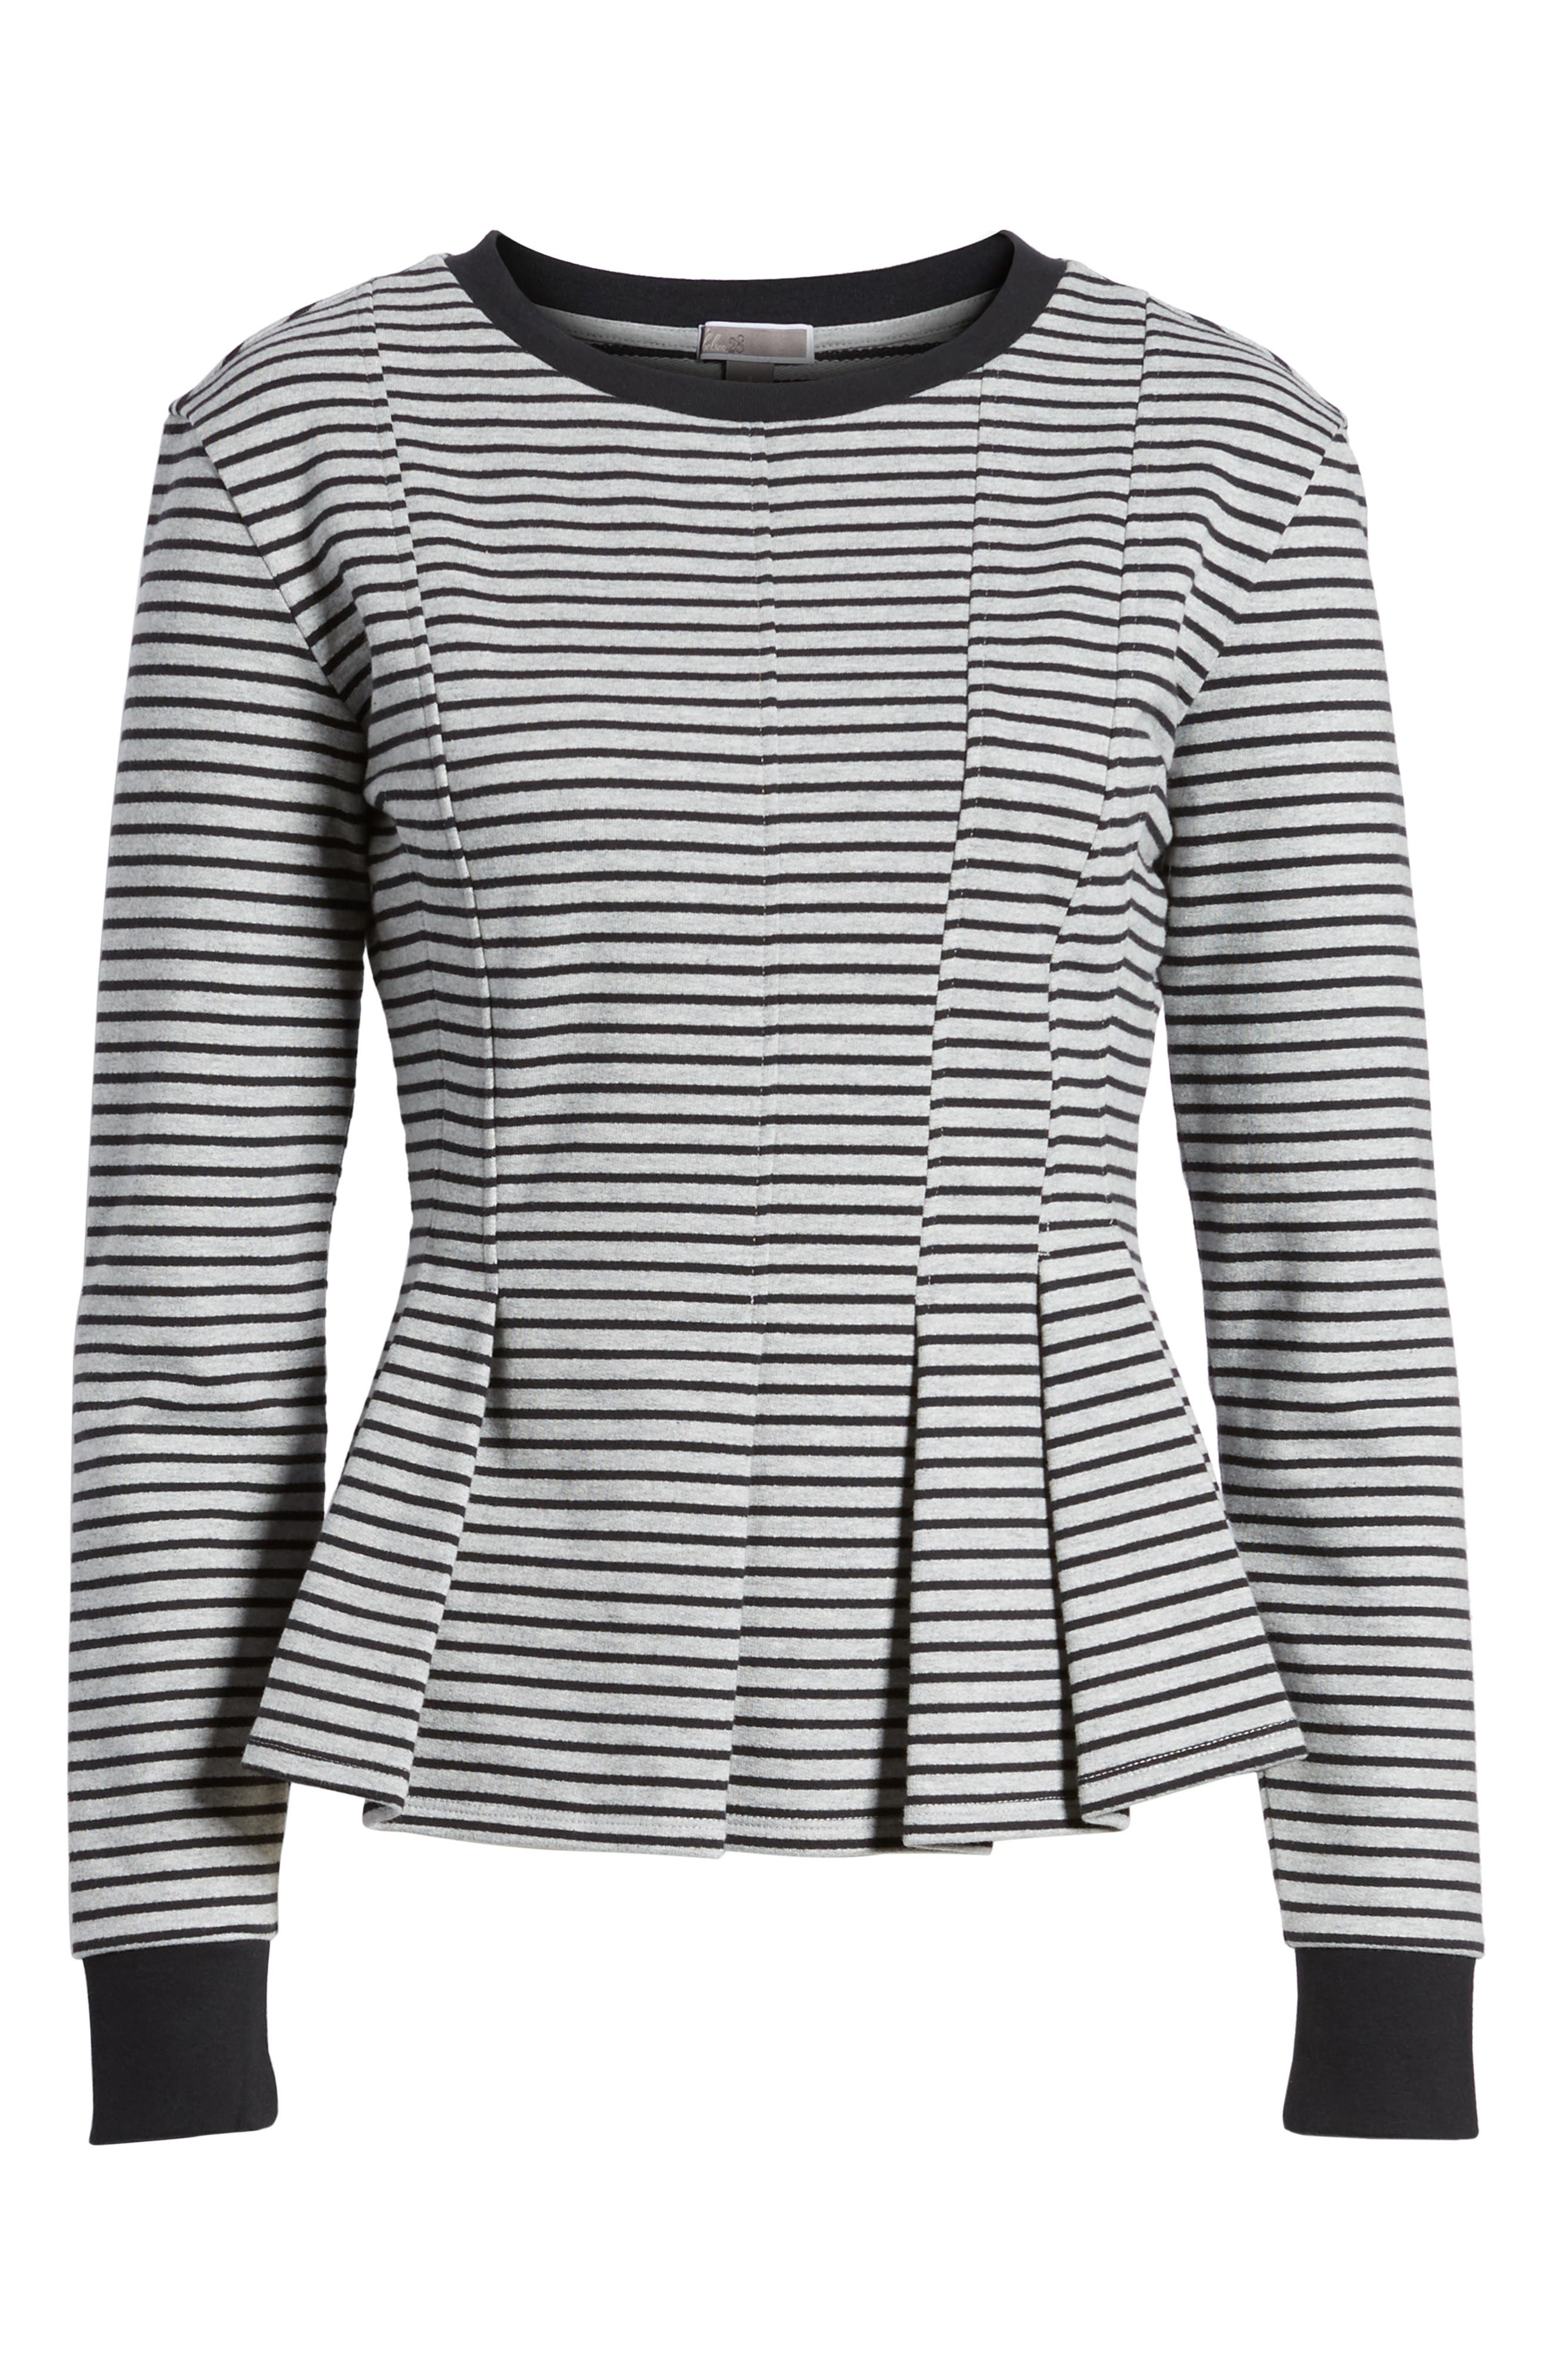 Pleated Sweatshirt,                             Alternate thumbnail 6, color,                             Grey Heather- Navy Seam Stripe